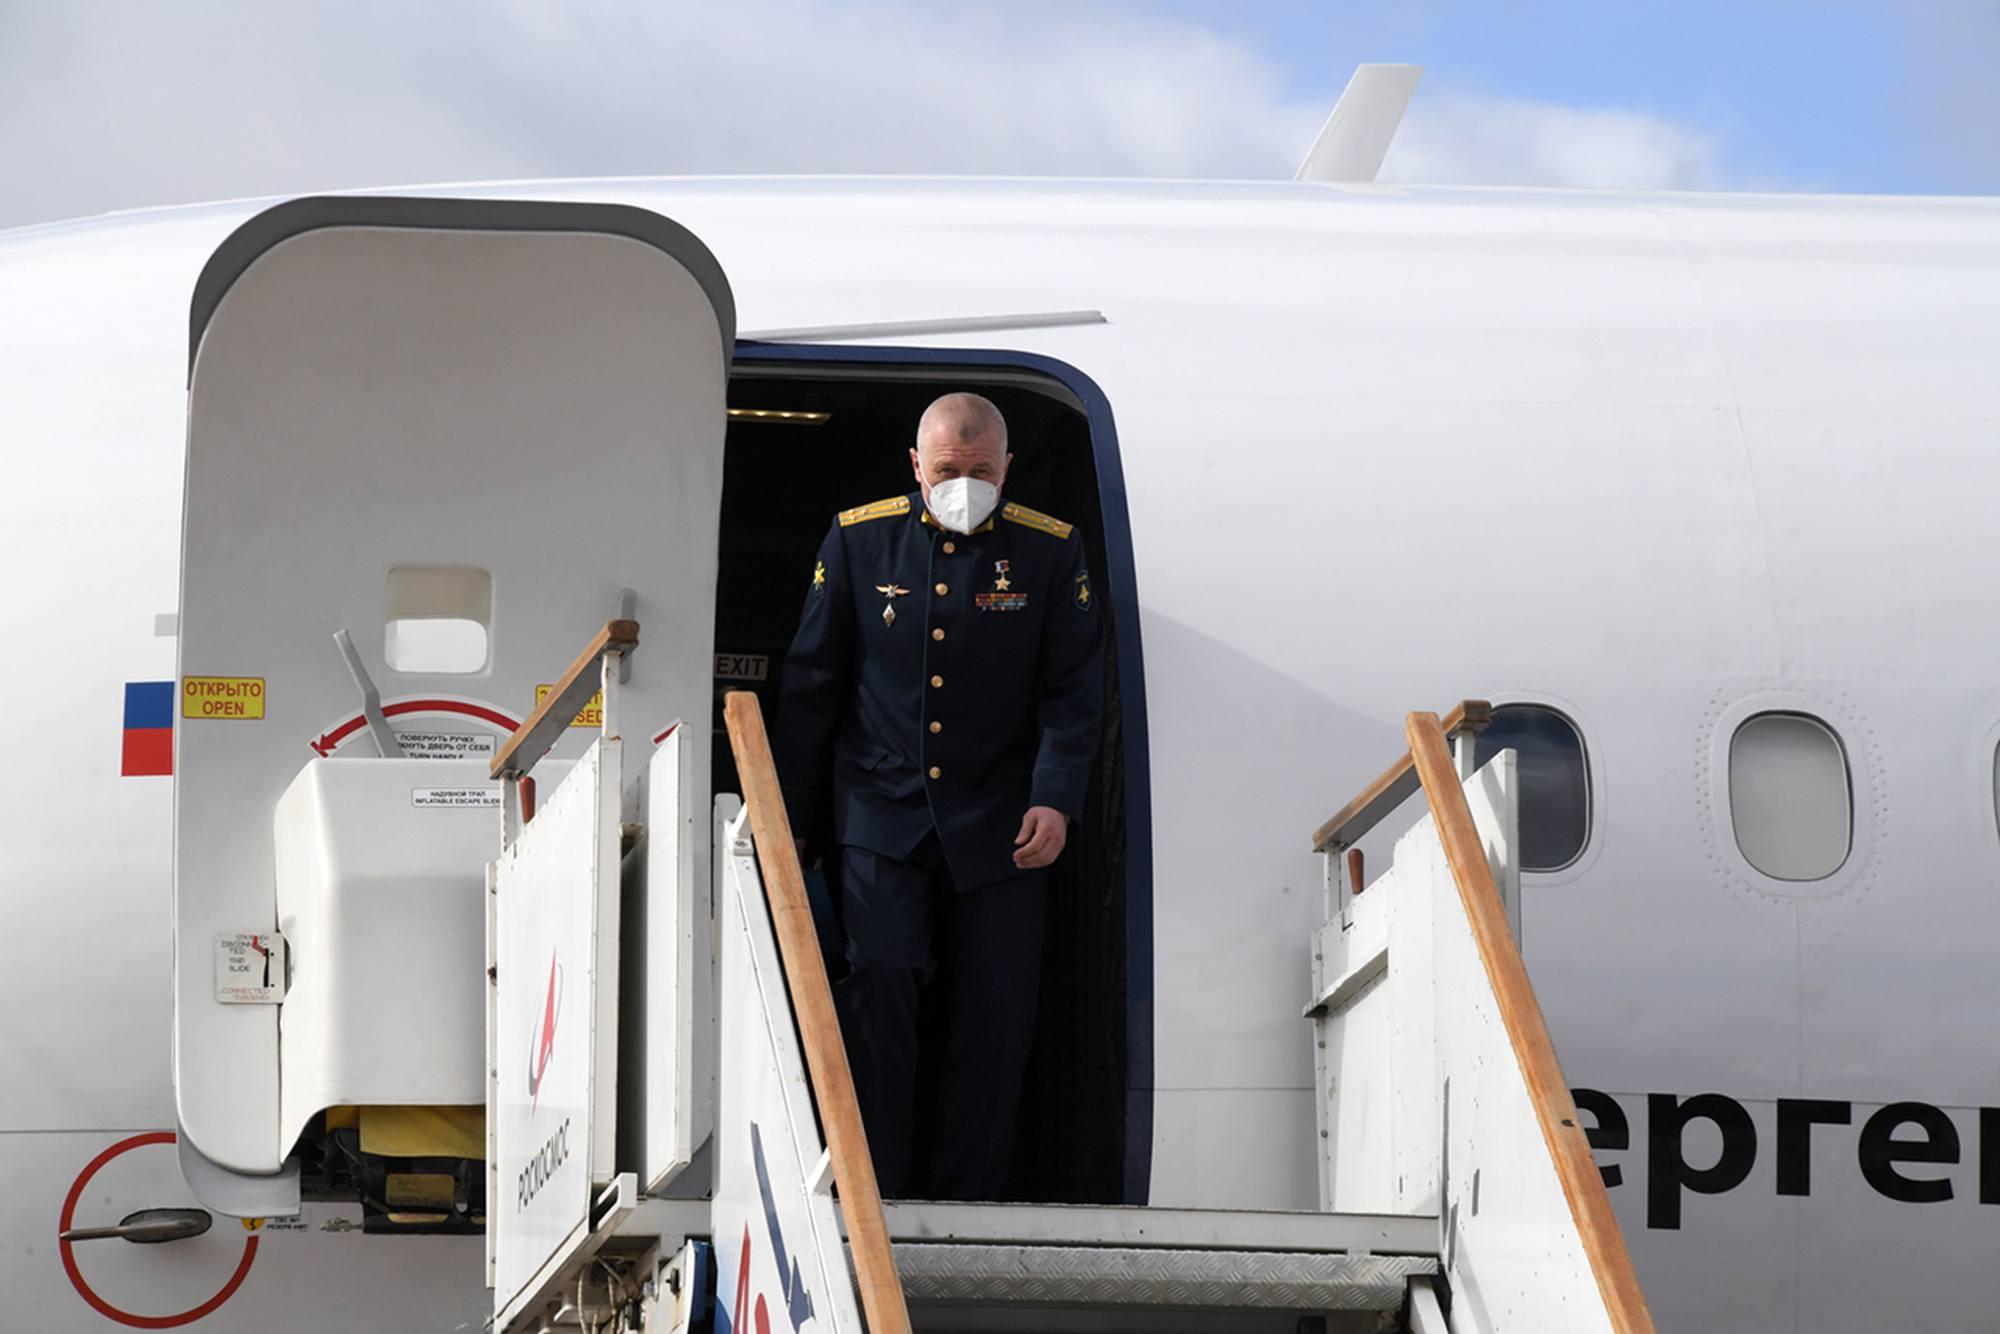 Oleg Novitsky sortant de l'avion à l'arrivée à Baïkonour.